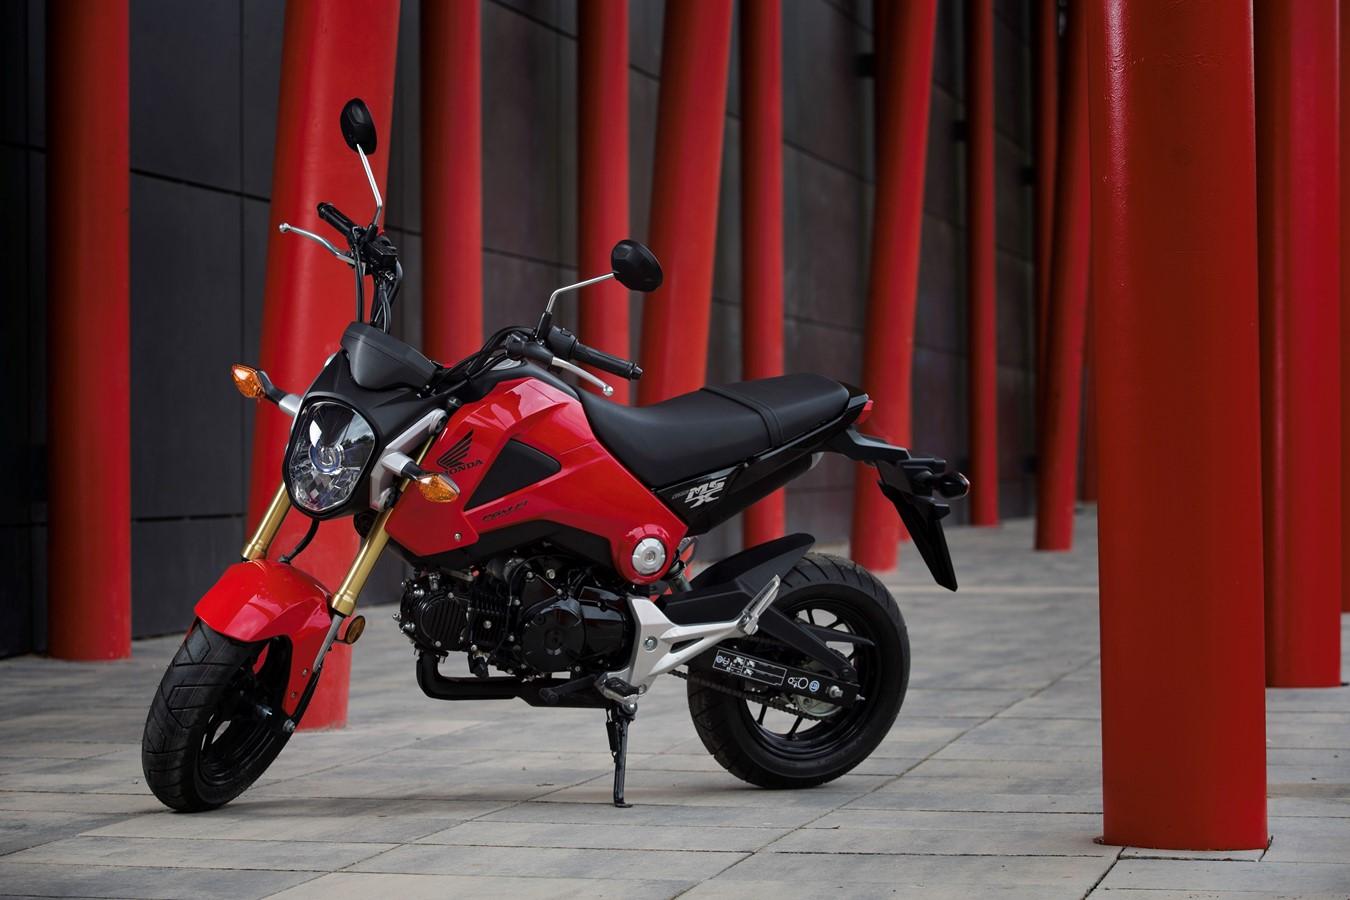 Mototehnika - Honda Keskus